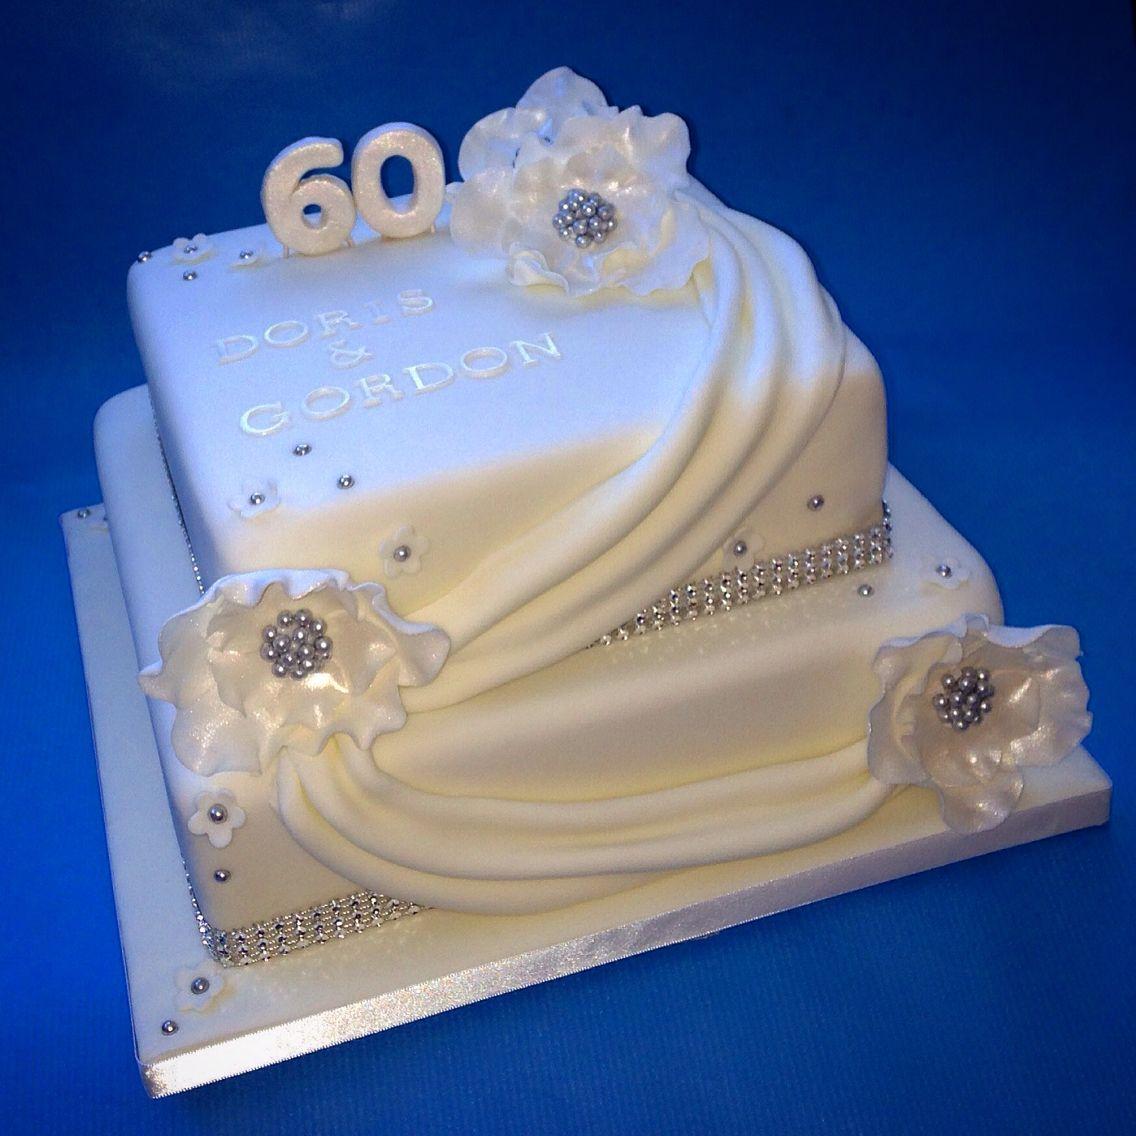 Diamond Wedding Anniversary Cake cakes I like